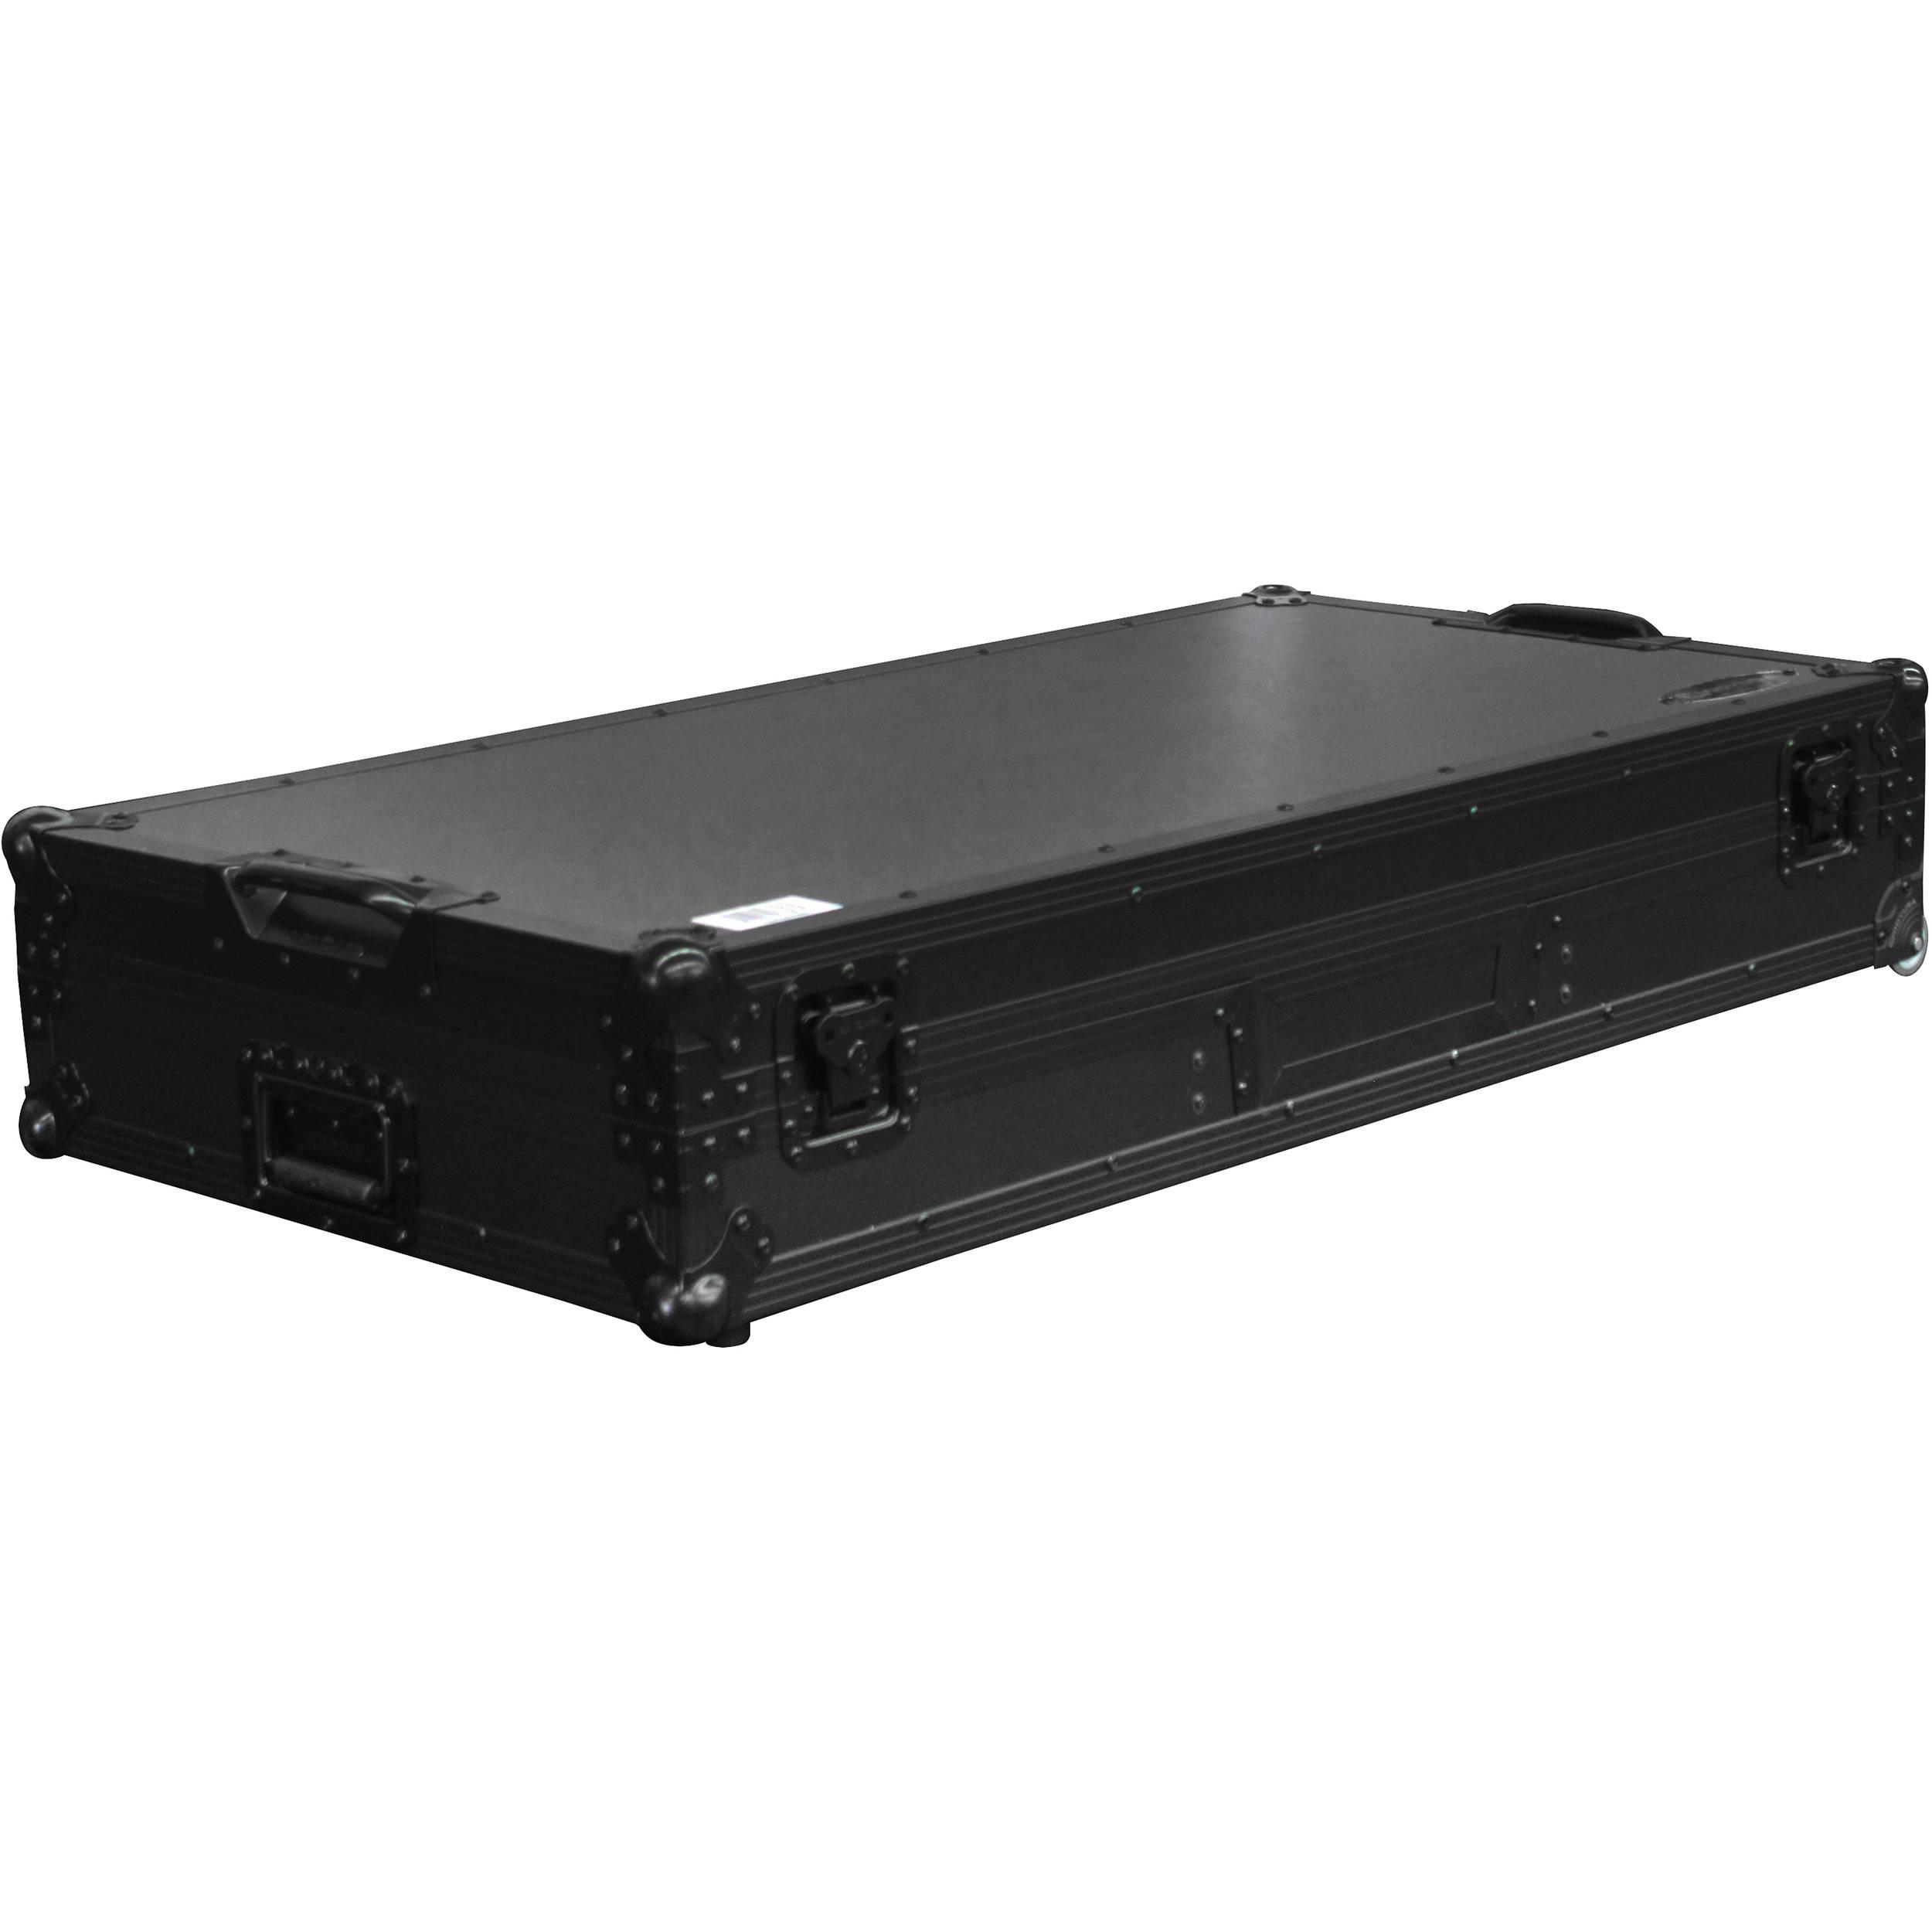 Coffin Designs Odyssey Innovative Designs Black Label Glide Style Fzgslbm10wbl